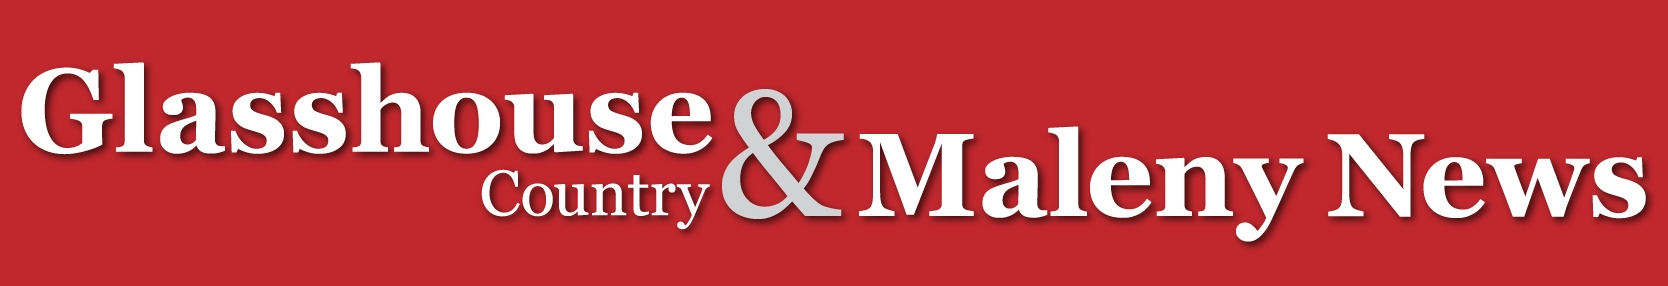 GCMNews Logo.jpg